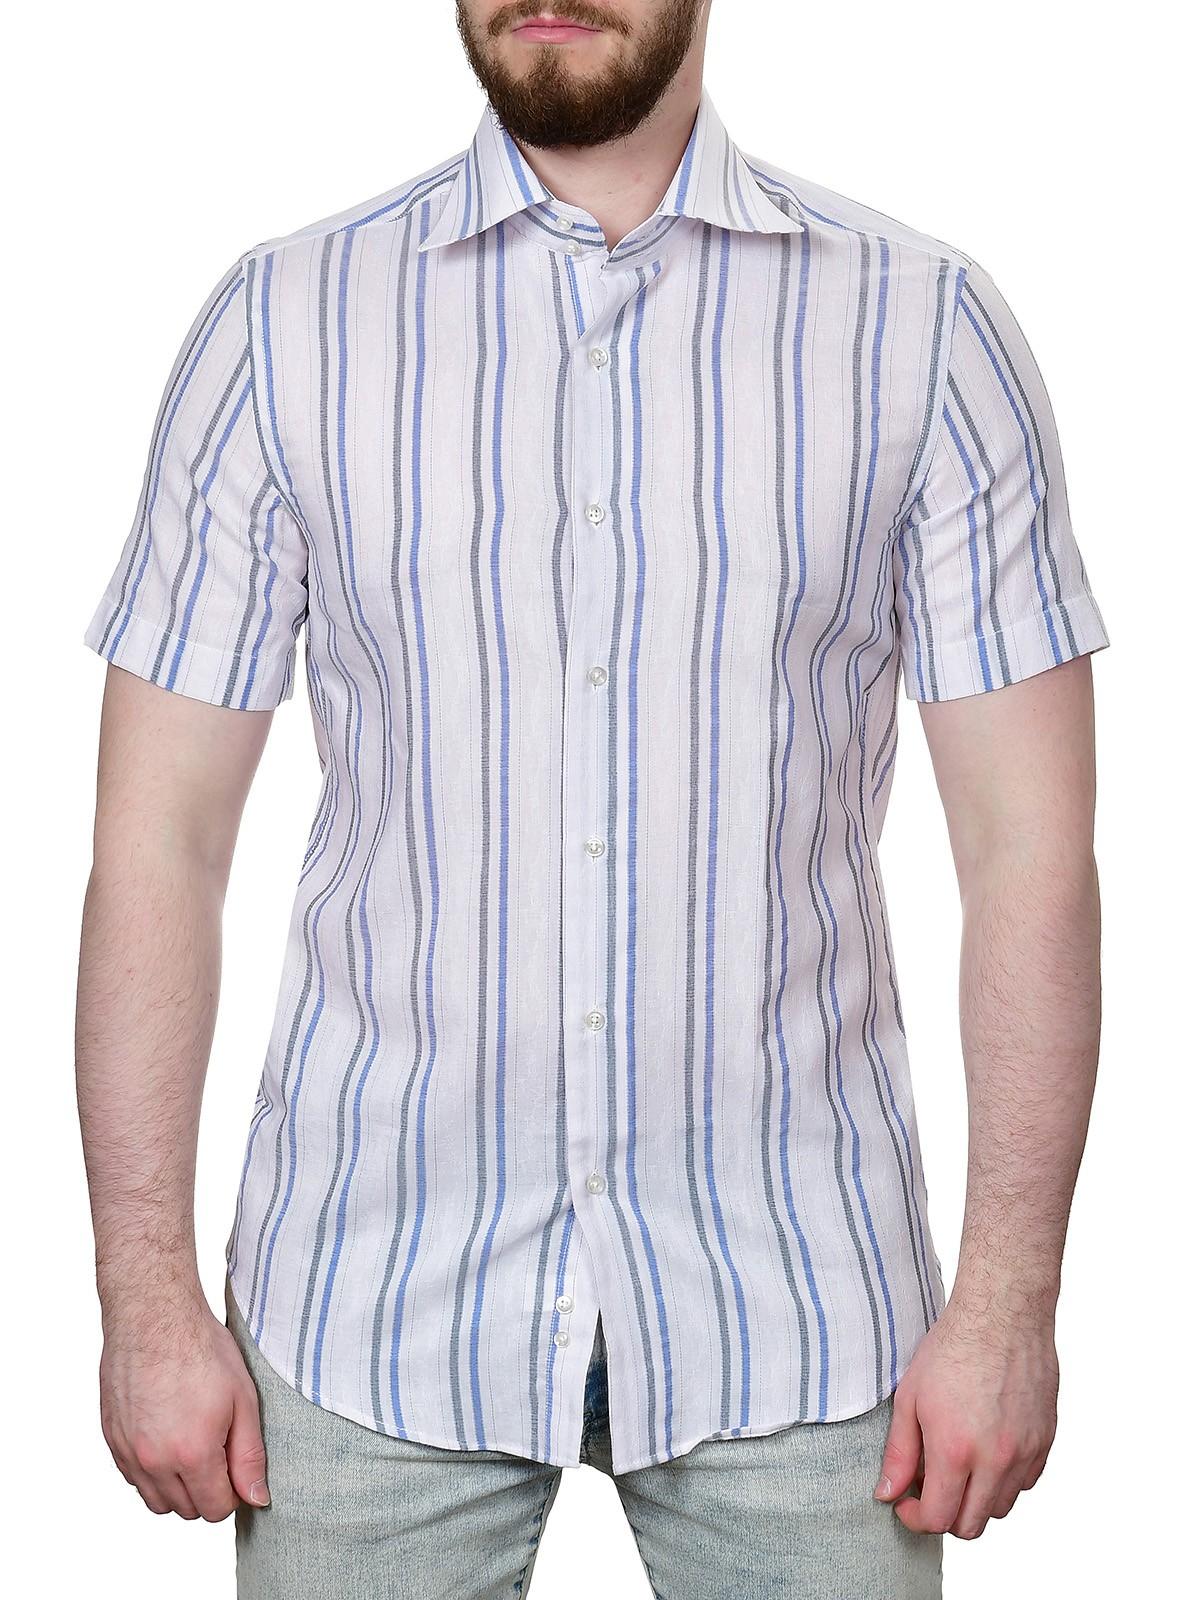 Фото - Рубашка Fayzoff S.A. мужская классическая рубашка dermay slim fit 4xl camisa masculina 6colors dm03241827